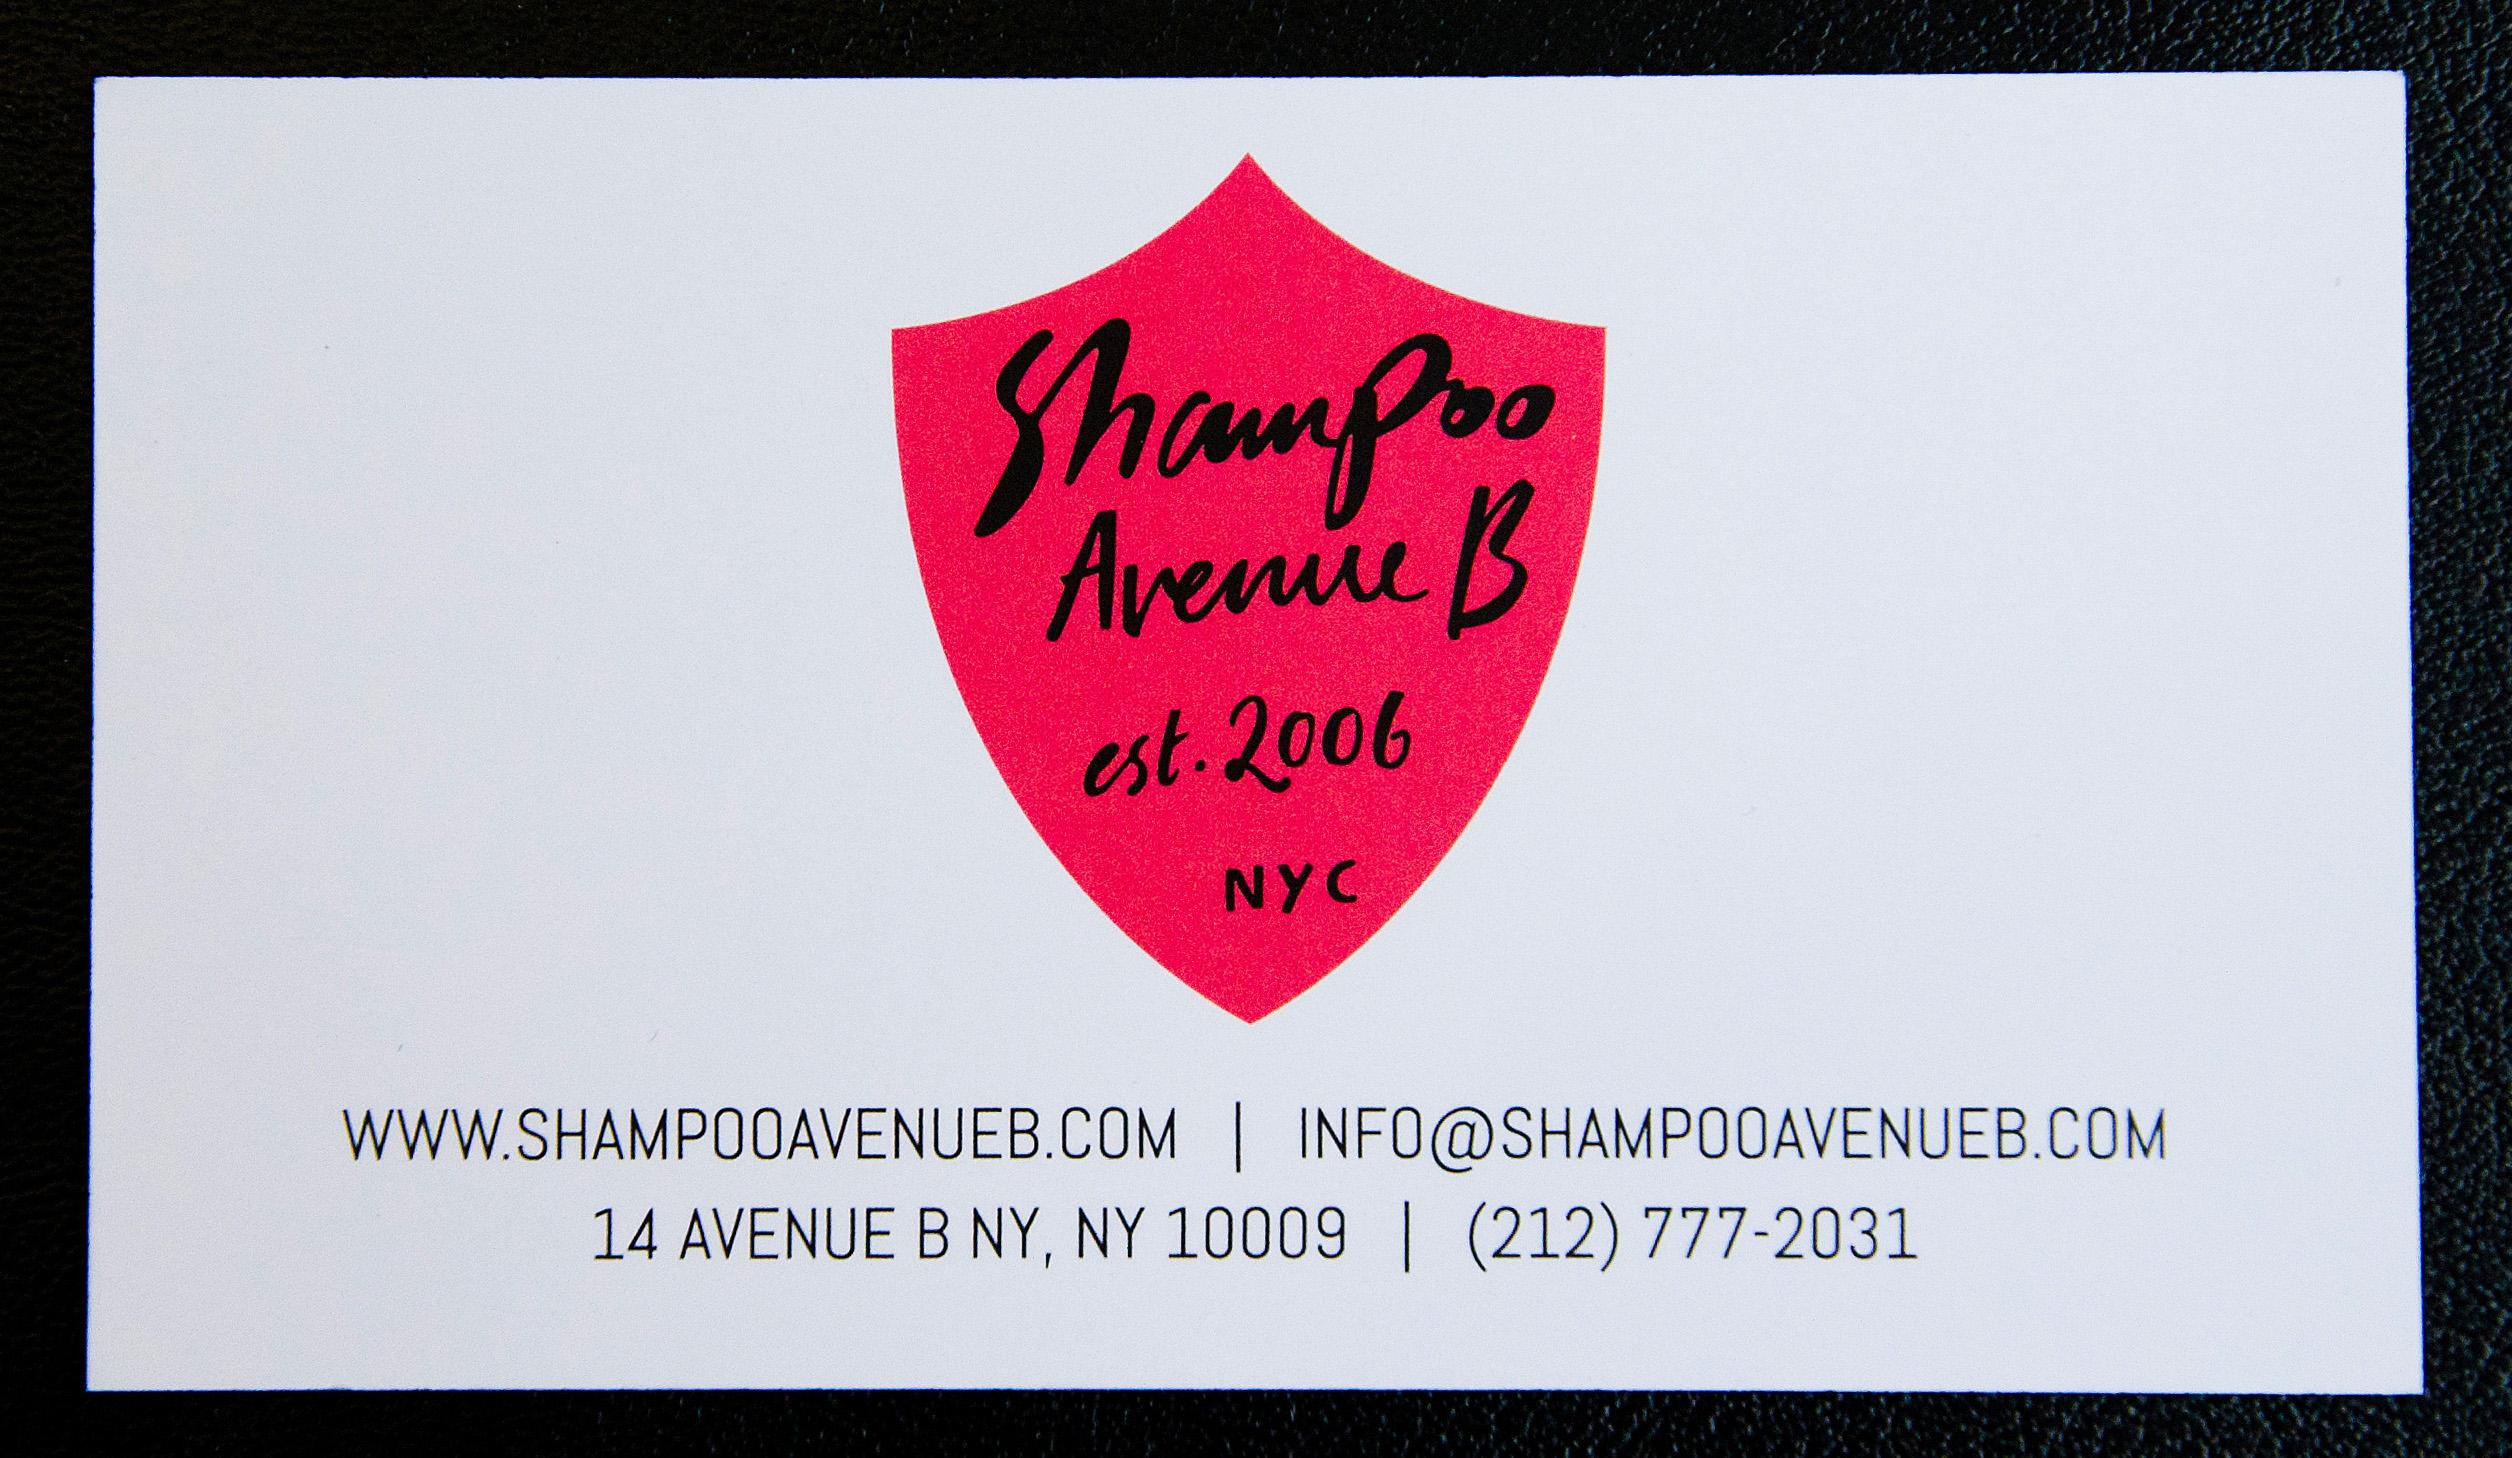 Shampoo Avenue B image 7